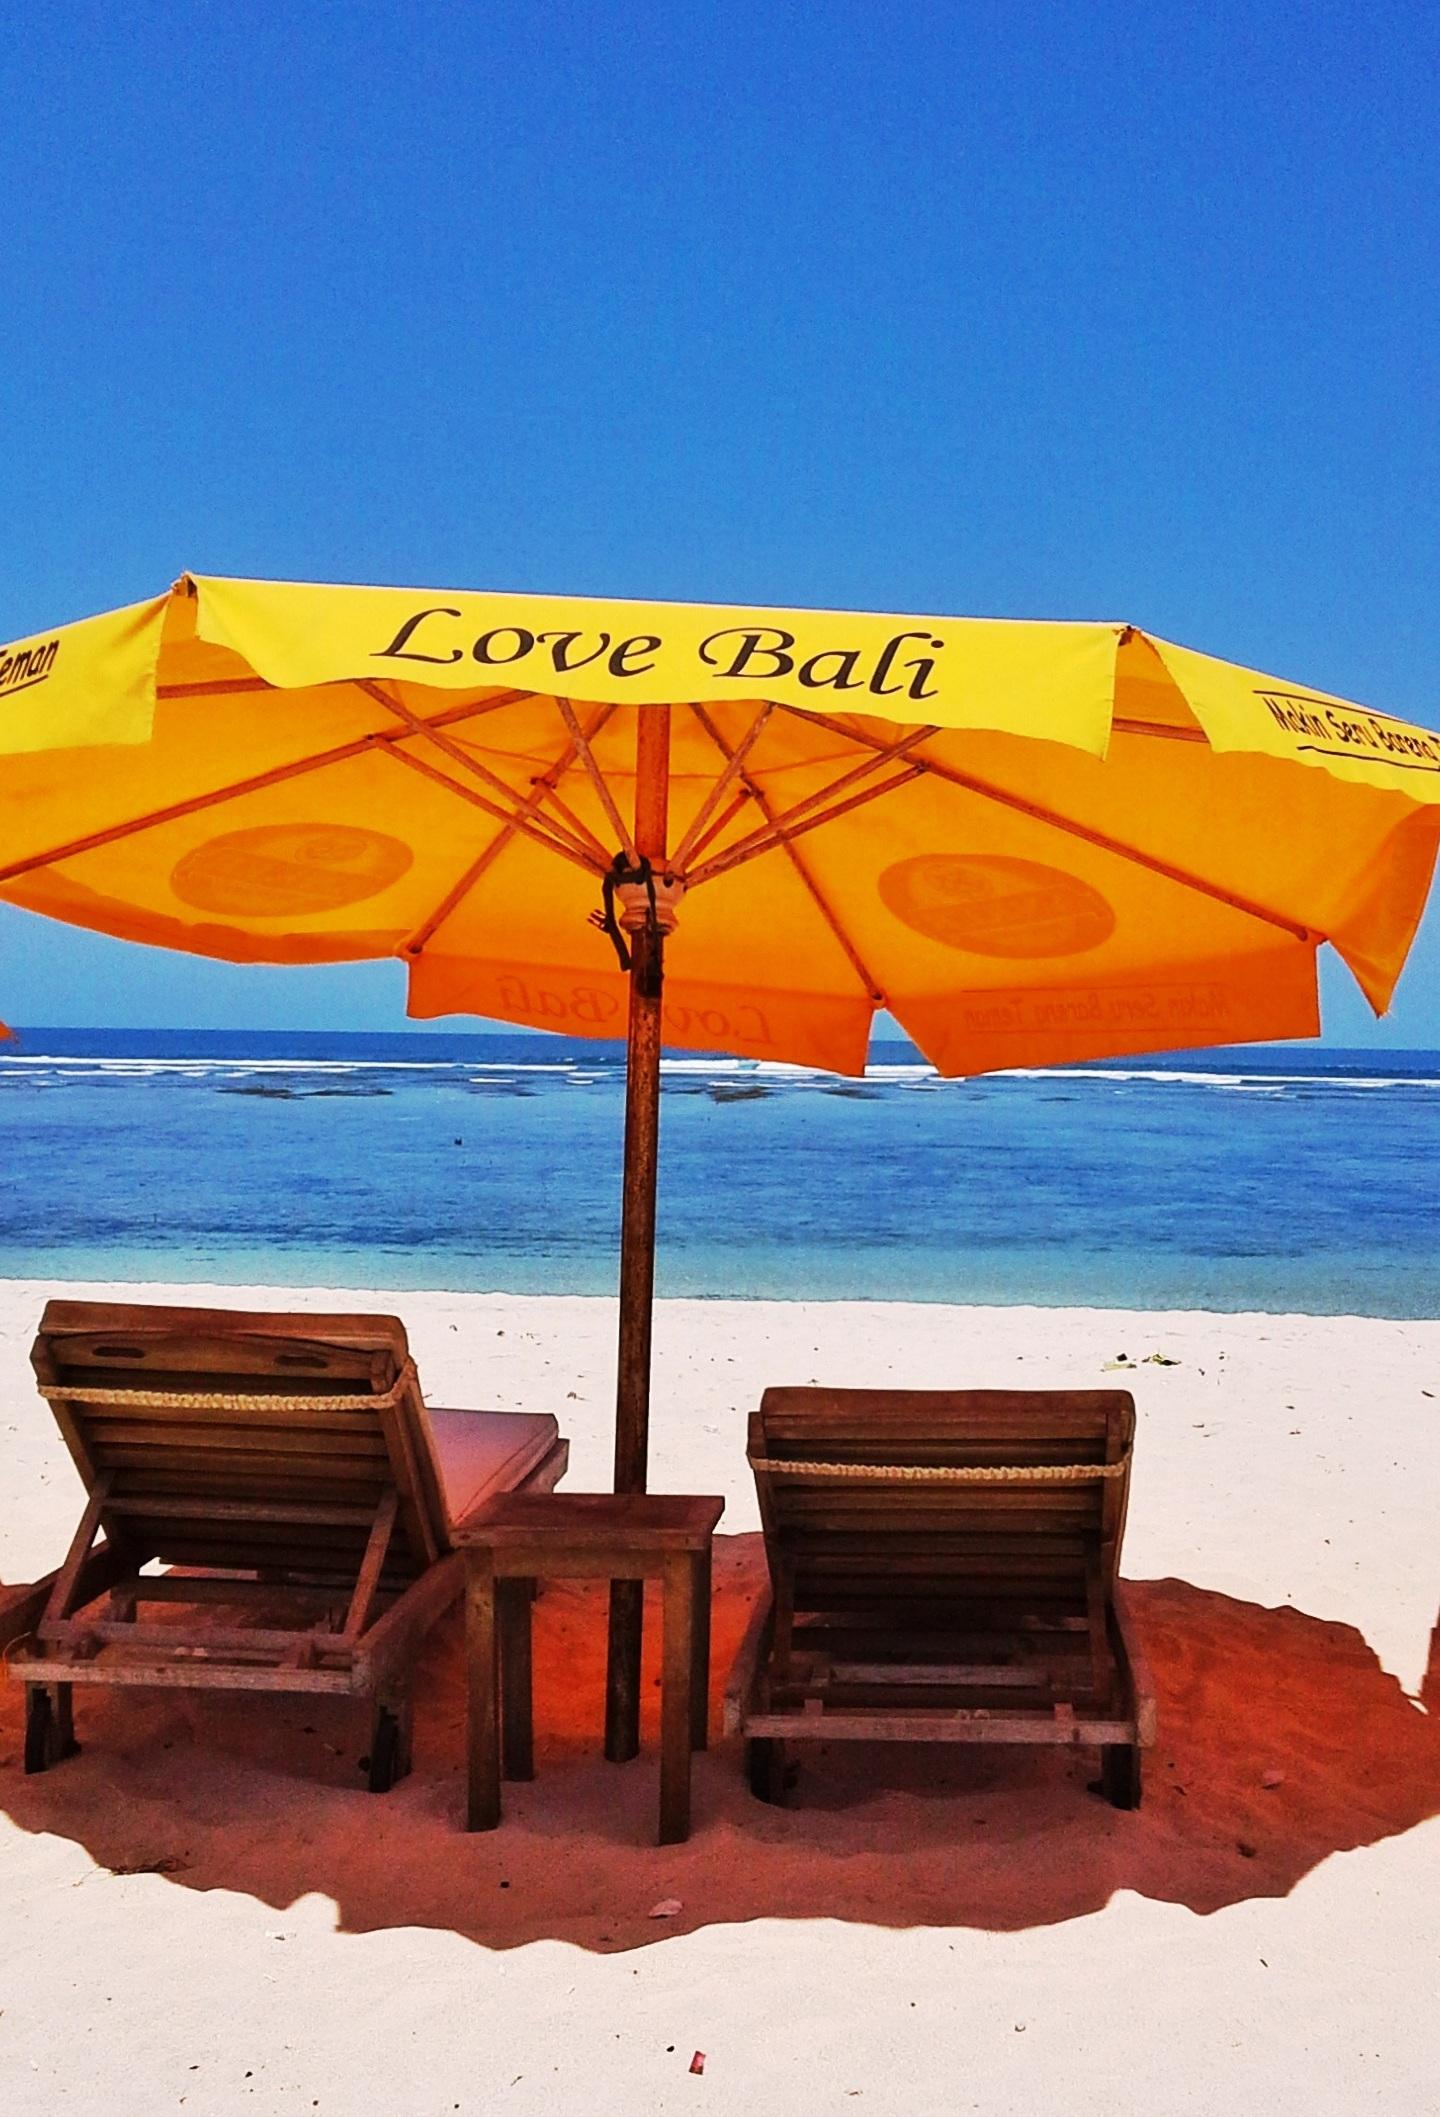 Bali i love